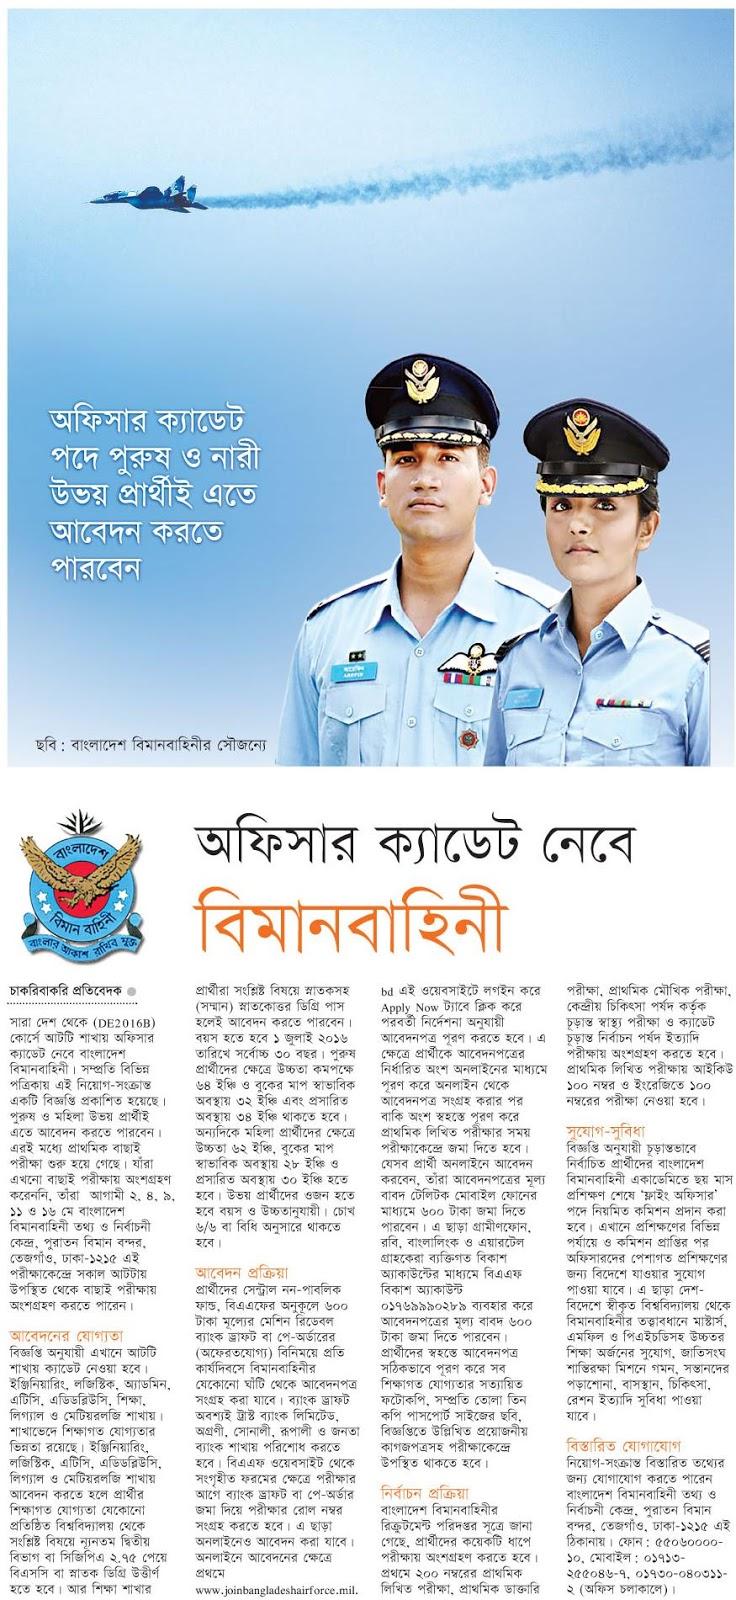 alljobcircularbd bangladesh air force